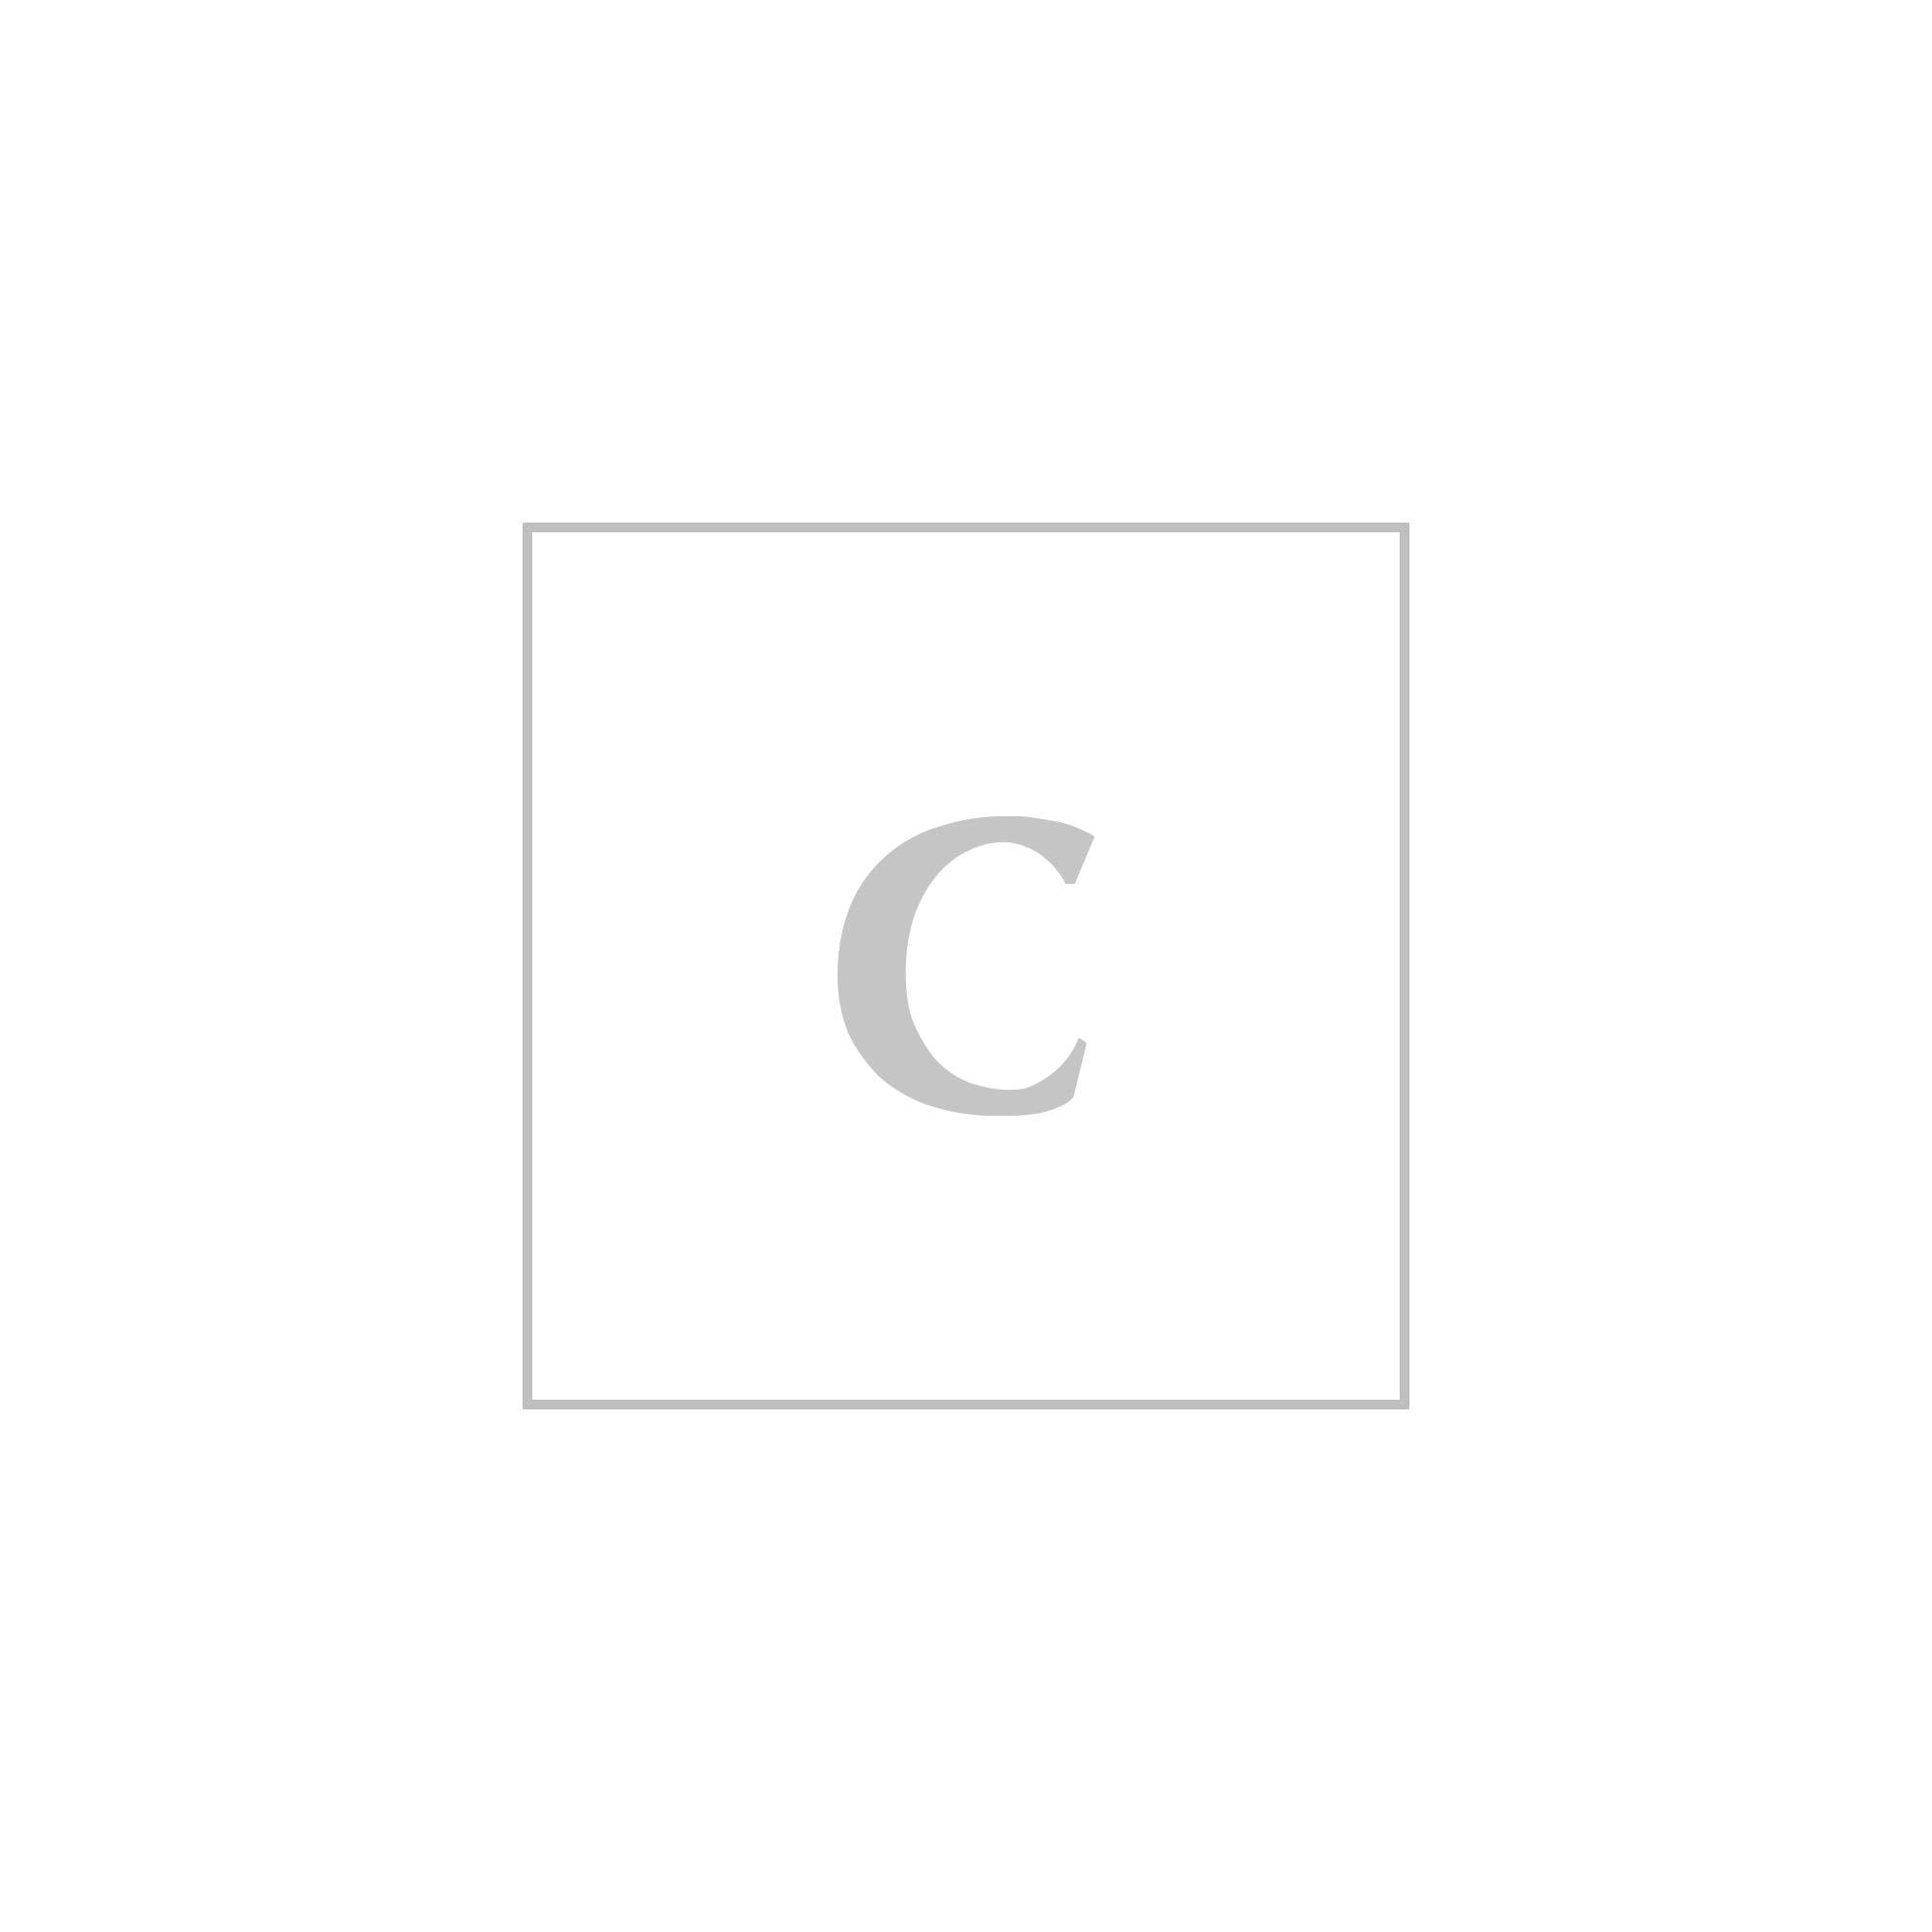 Dolce & gabbana sciarpa creponne 120x200